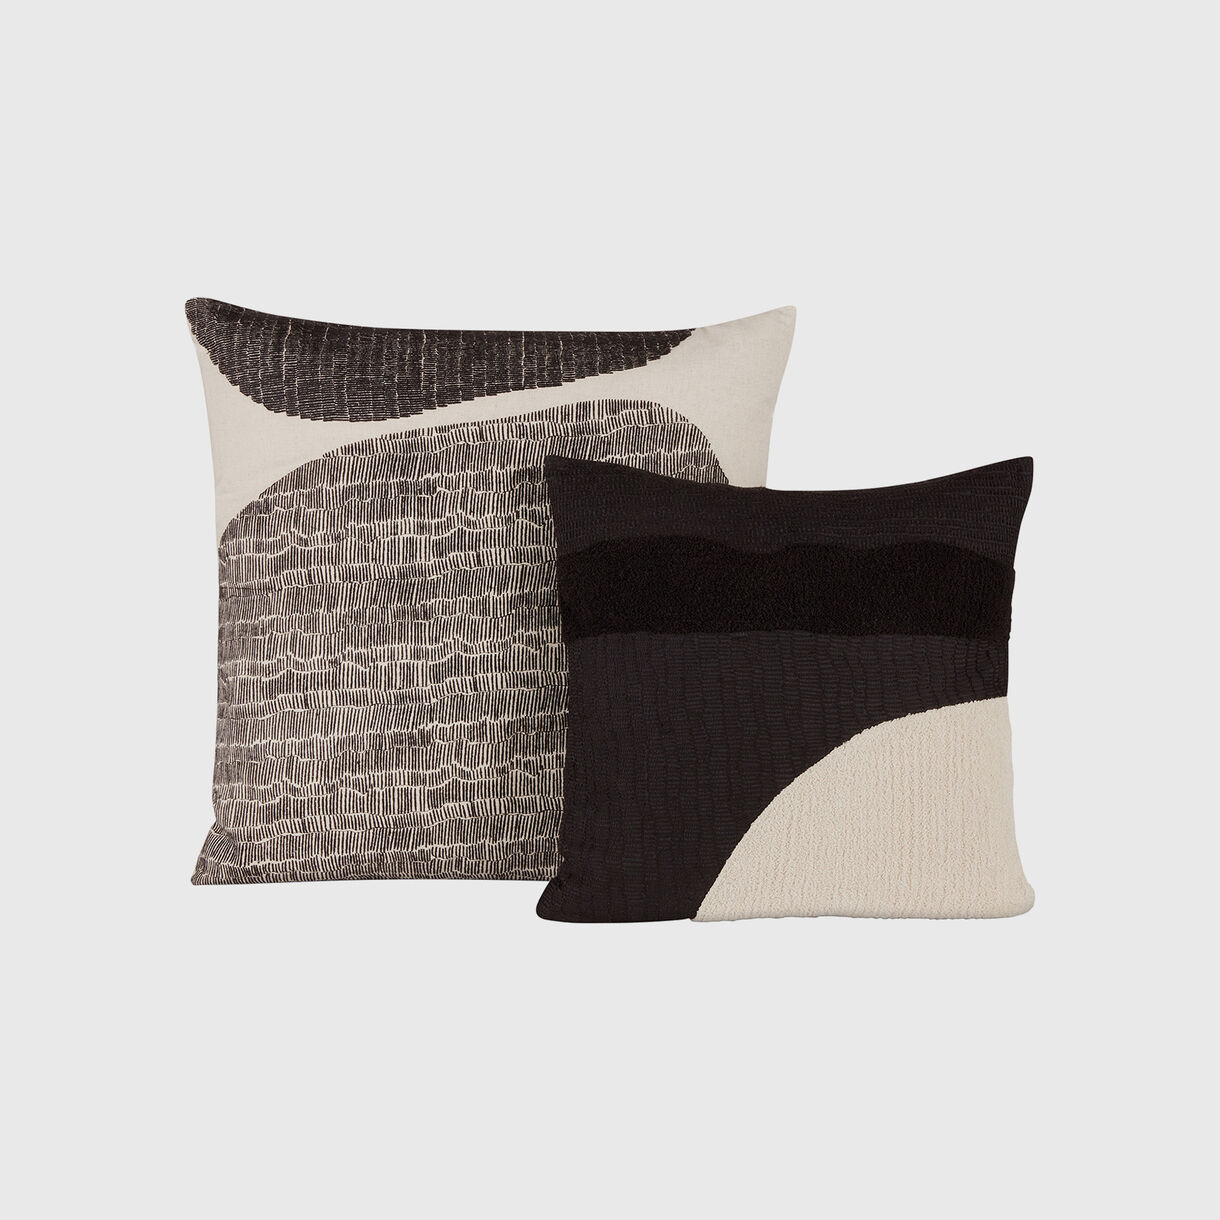 Stitch Cushions